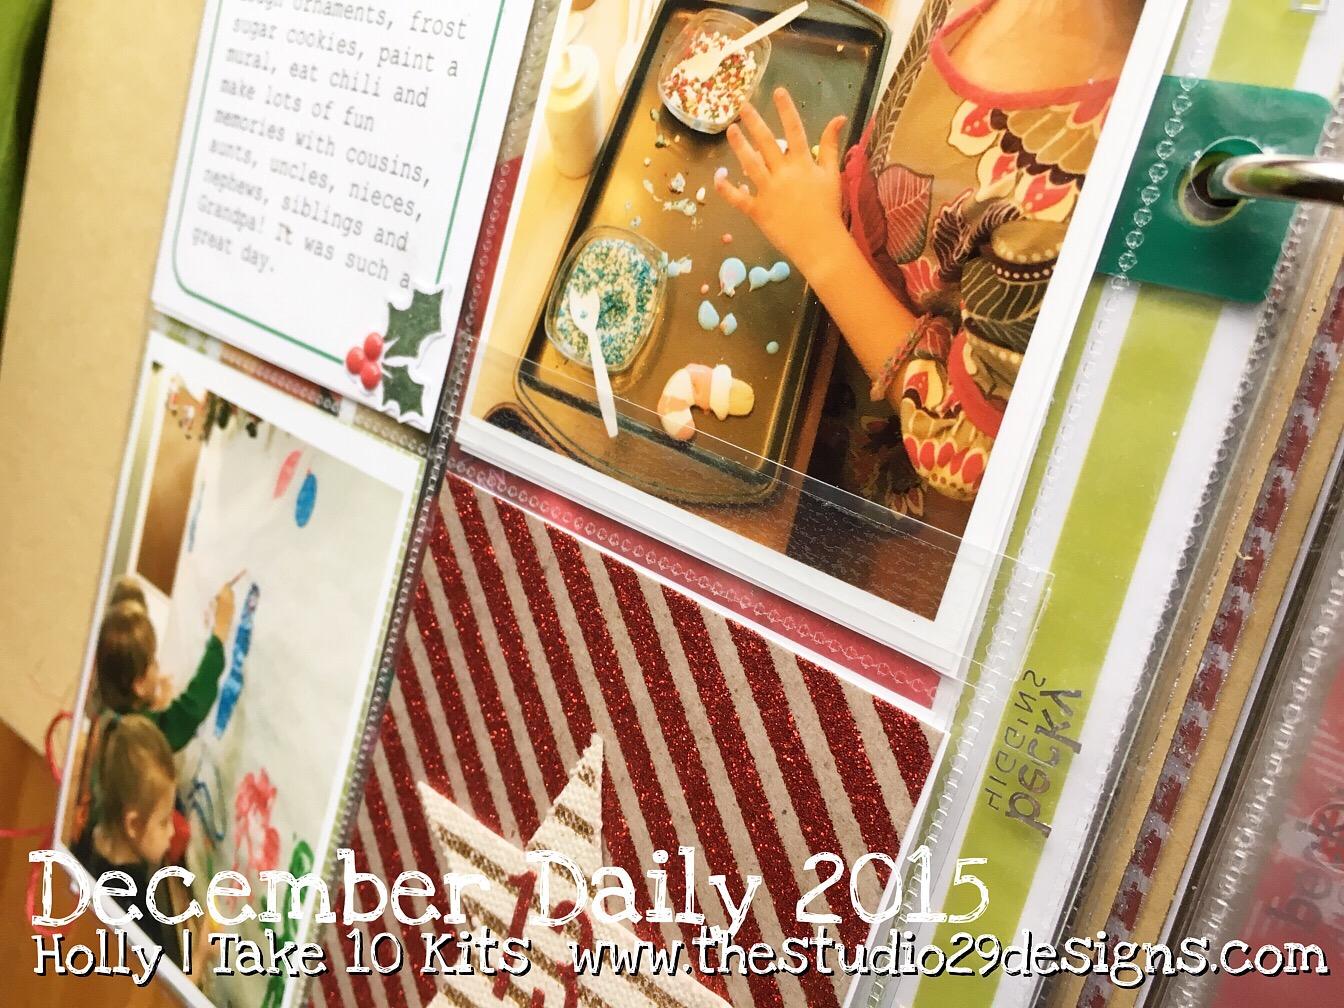 Holly   Take 10 Kits  www.thestudio29designs.com